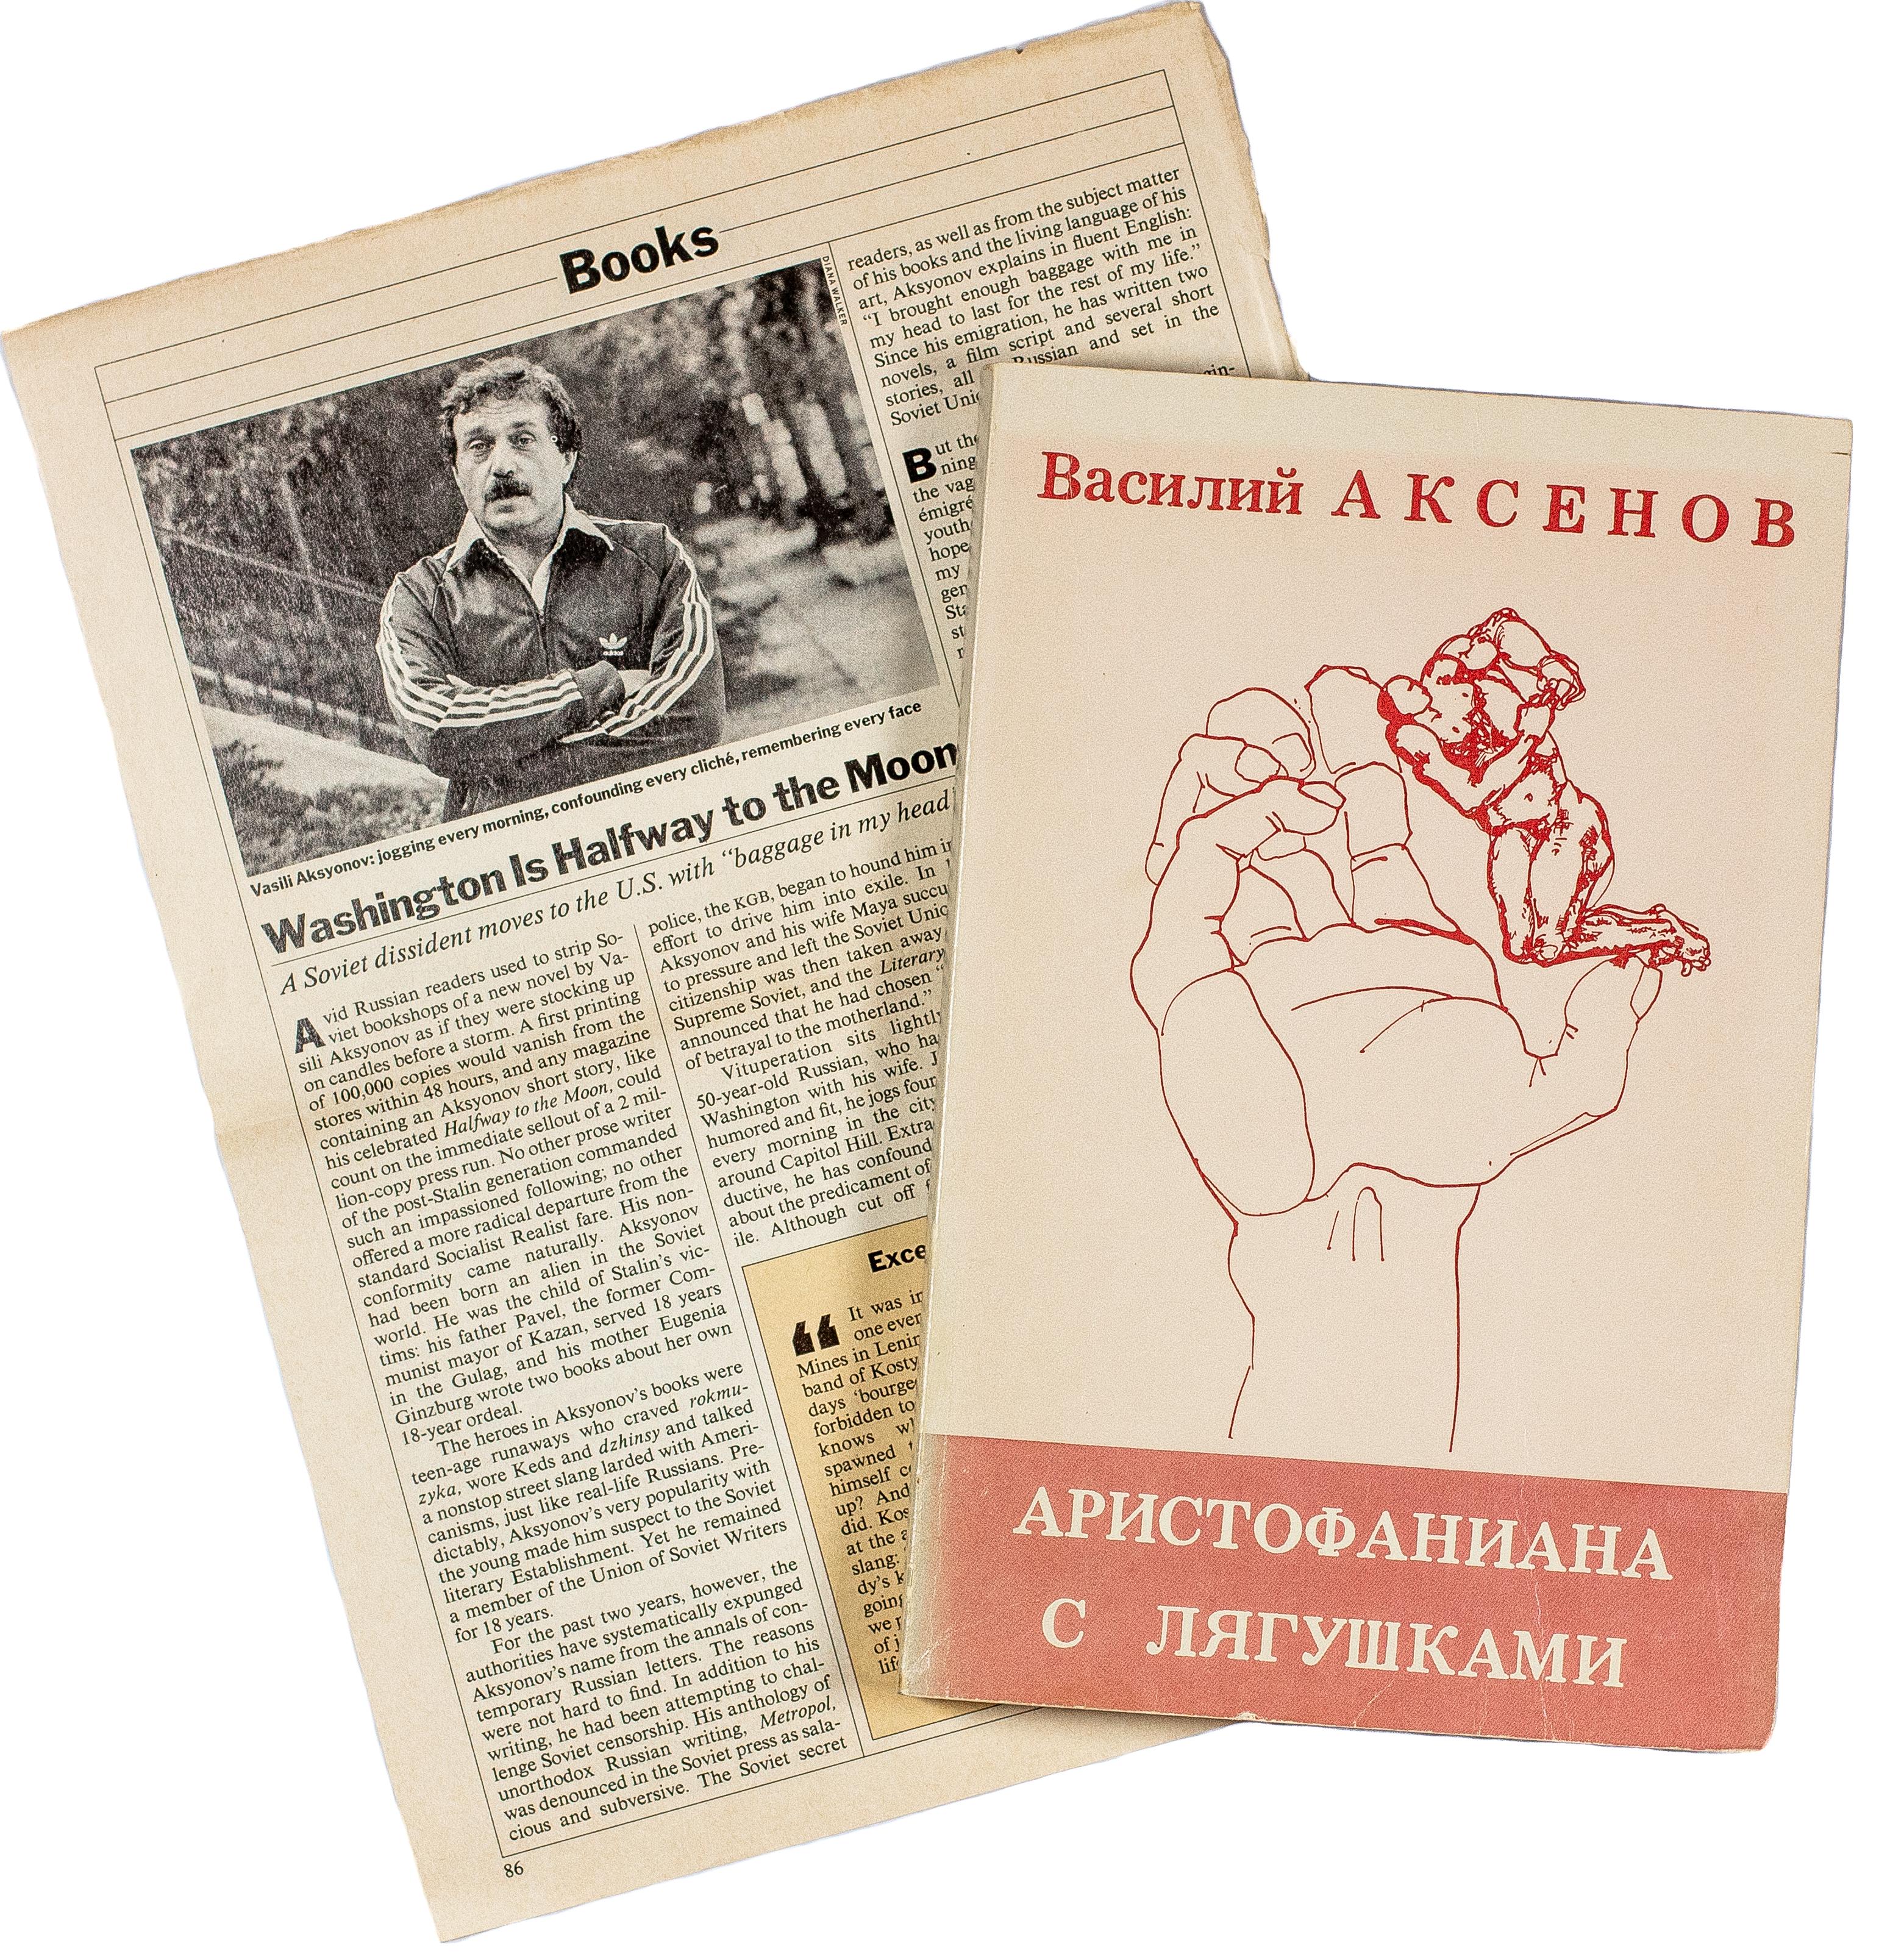 Lot 435 - {ДАРСТВЕННАЯ НАДПИСЬ ПОЭТУ} AKSENOV, Vassli. Aristophaniana [...]